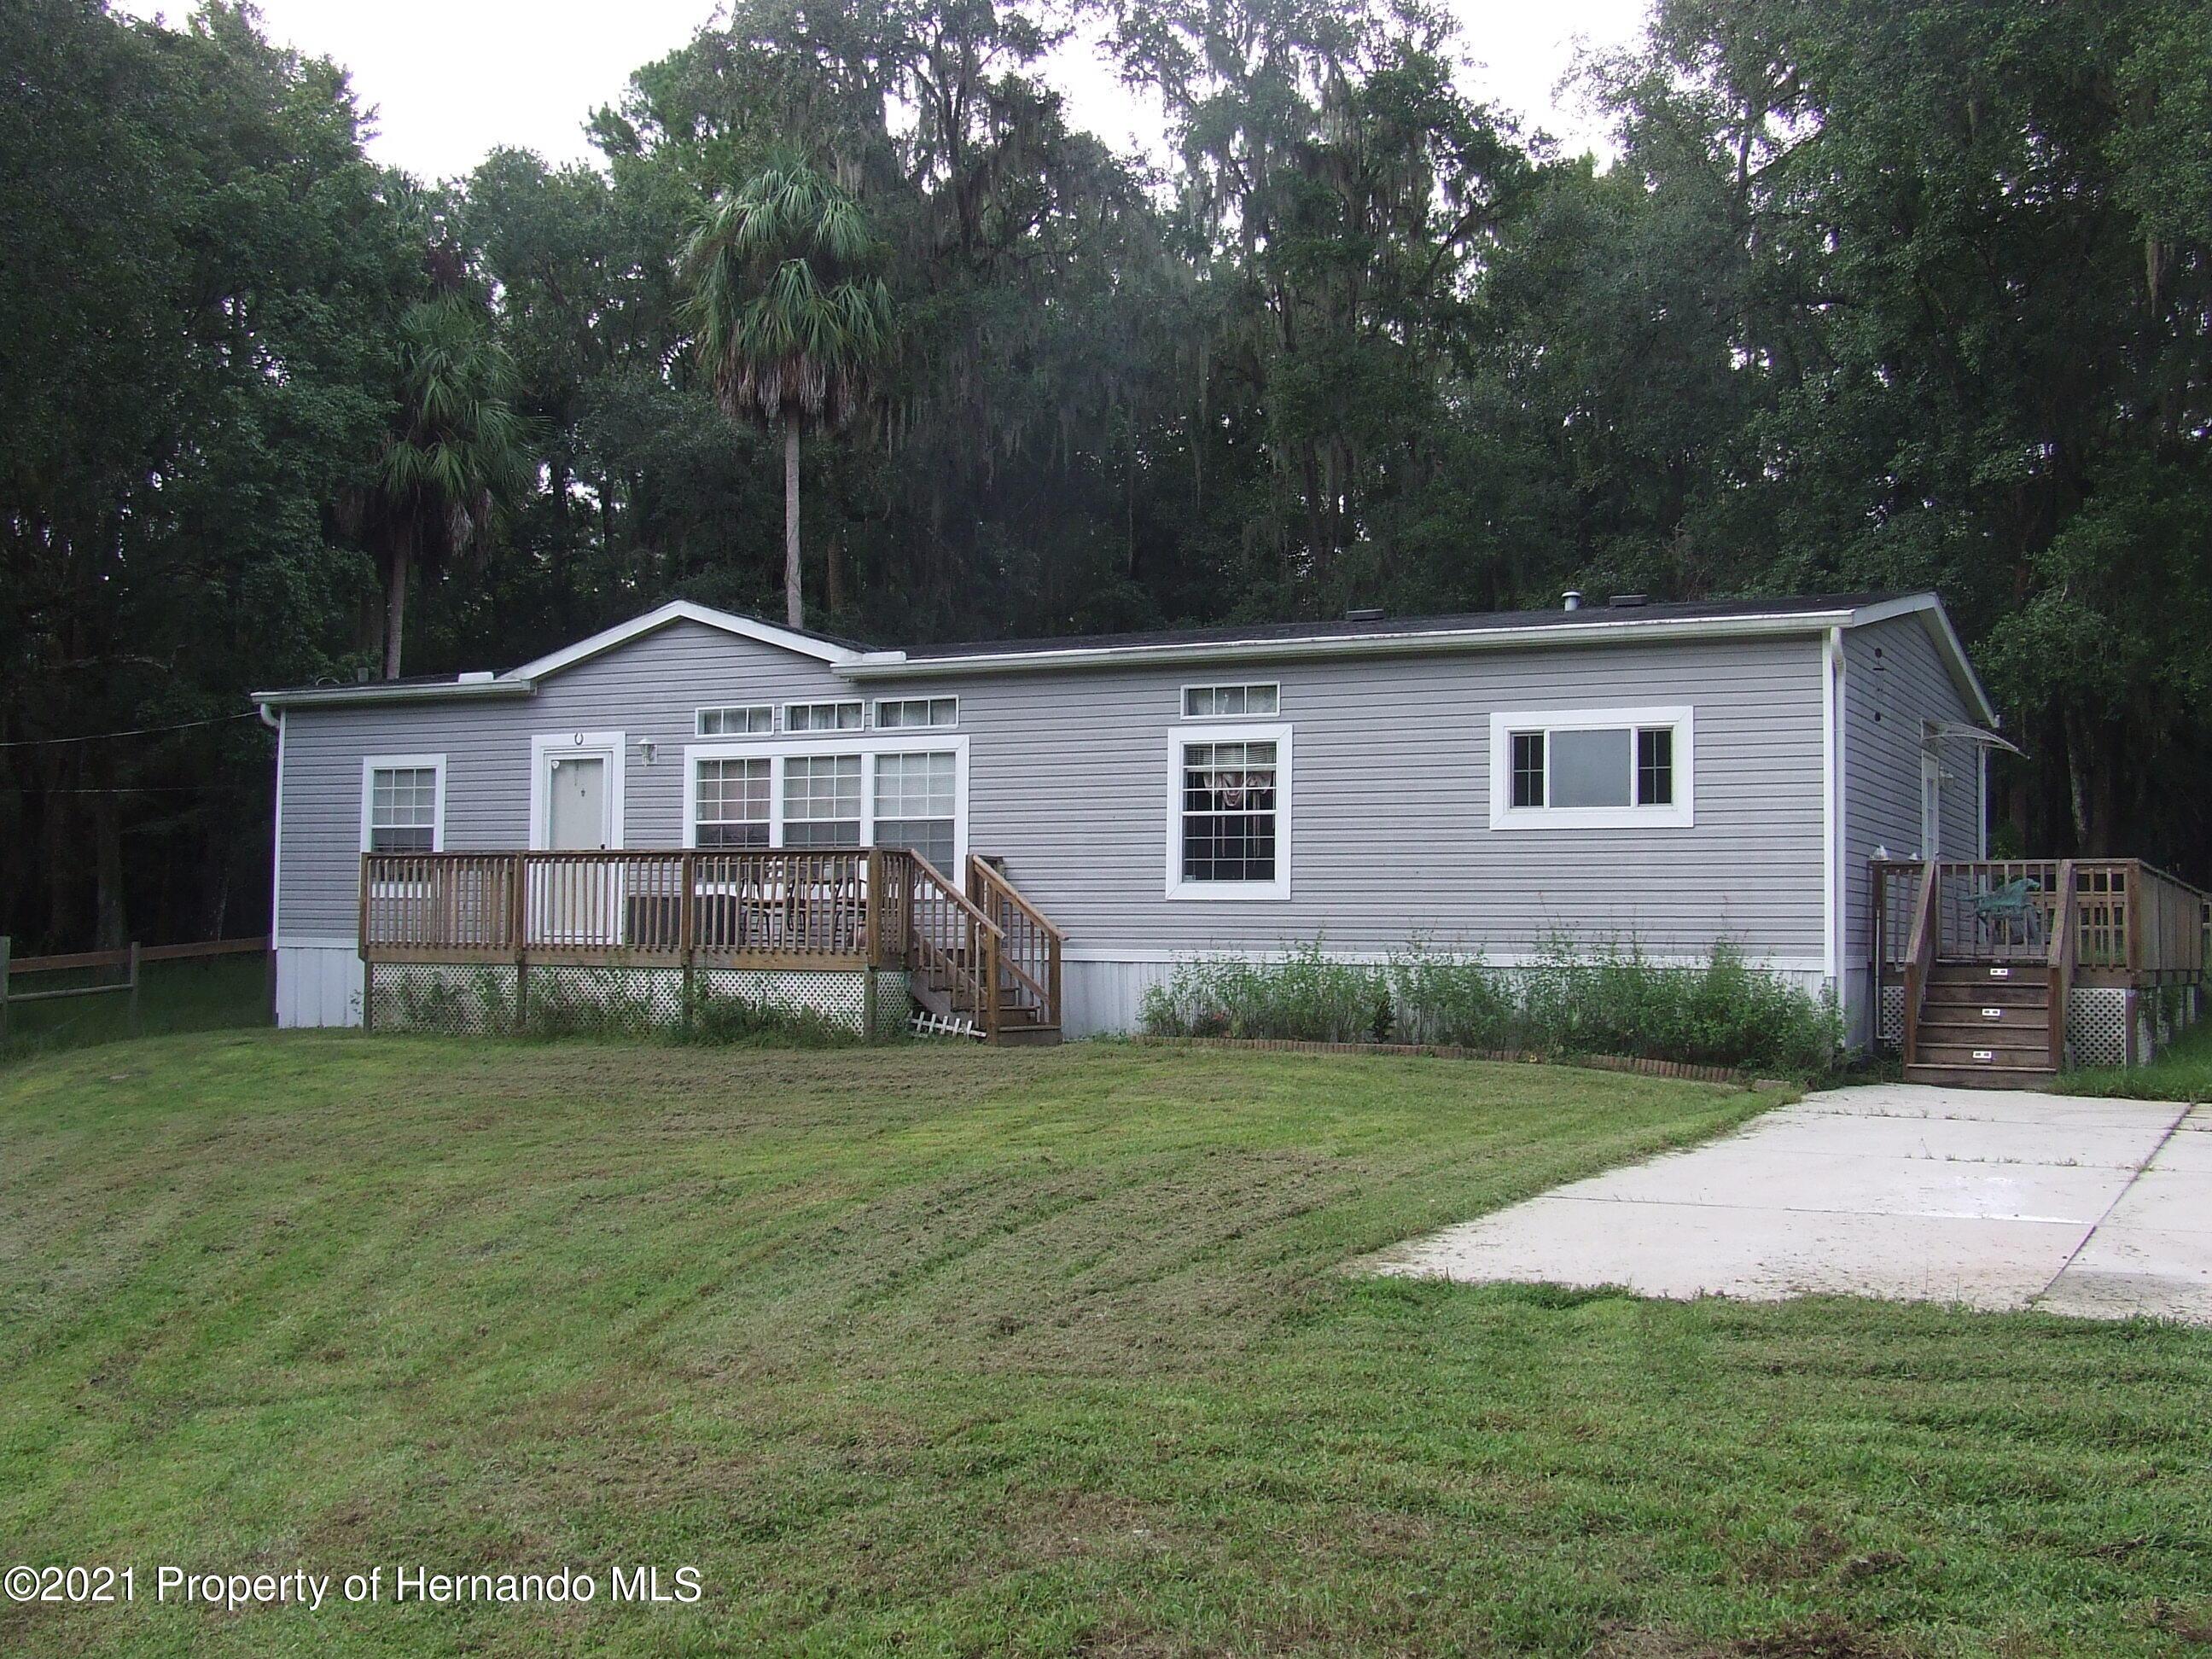 Details for 5325 Emerson Road, Brooksville, FL 34601